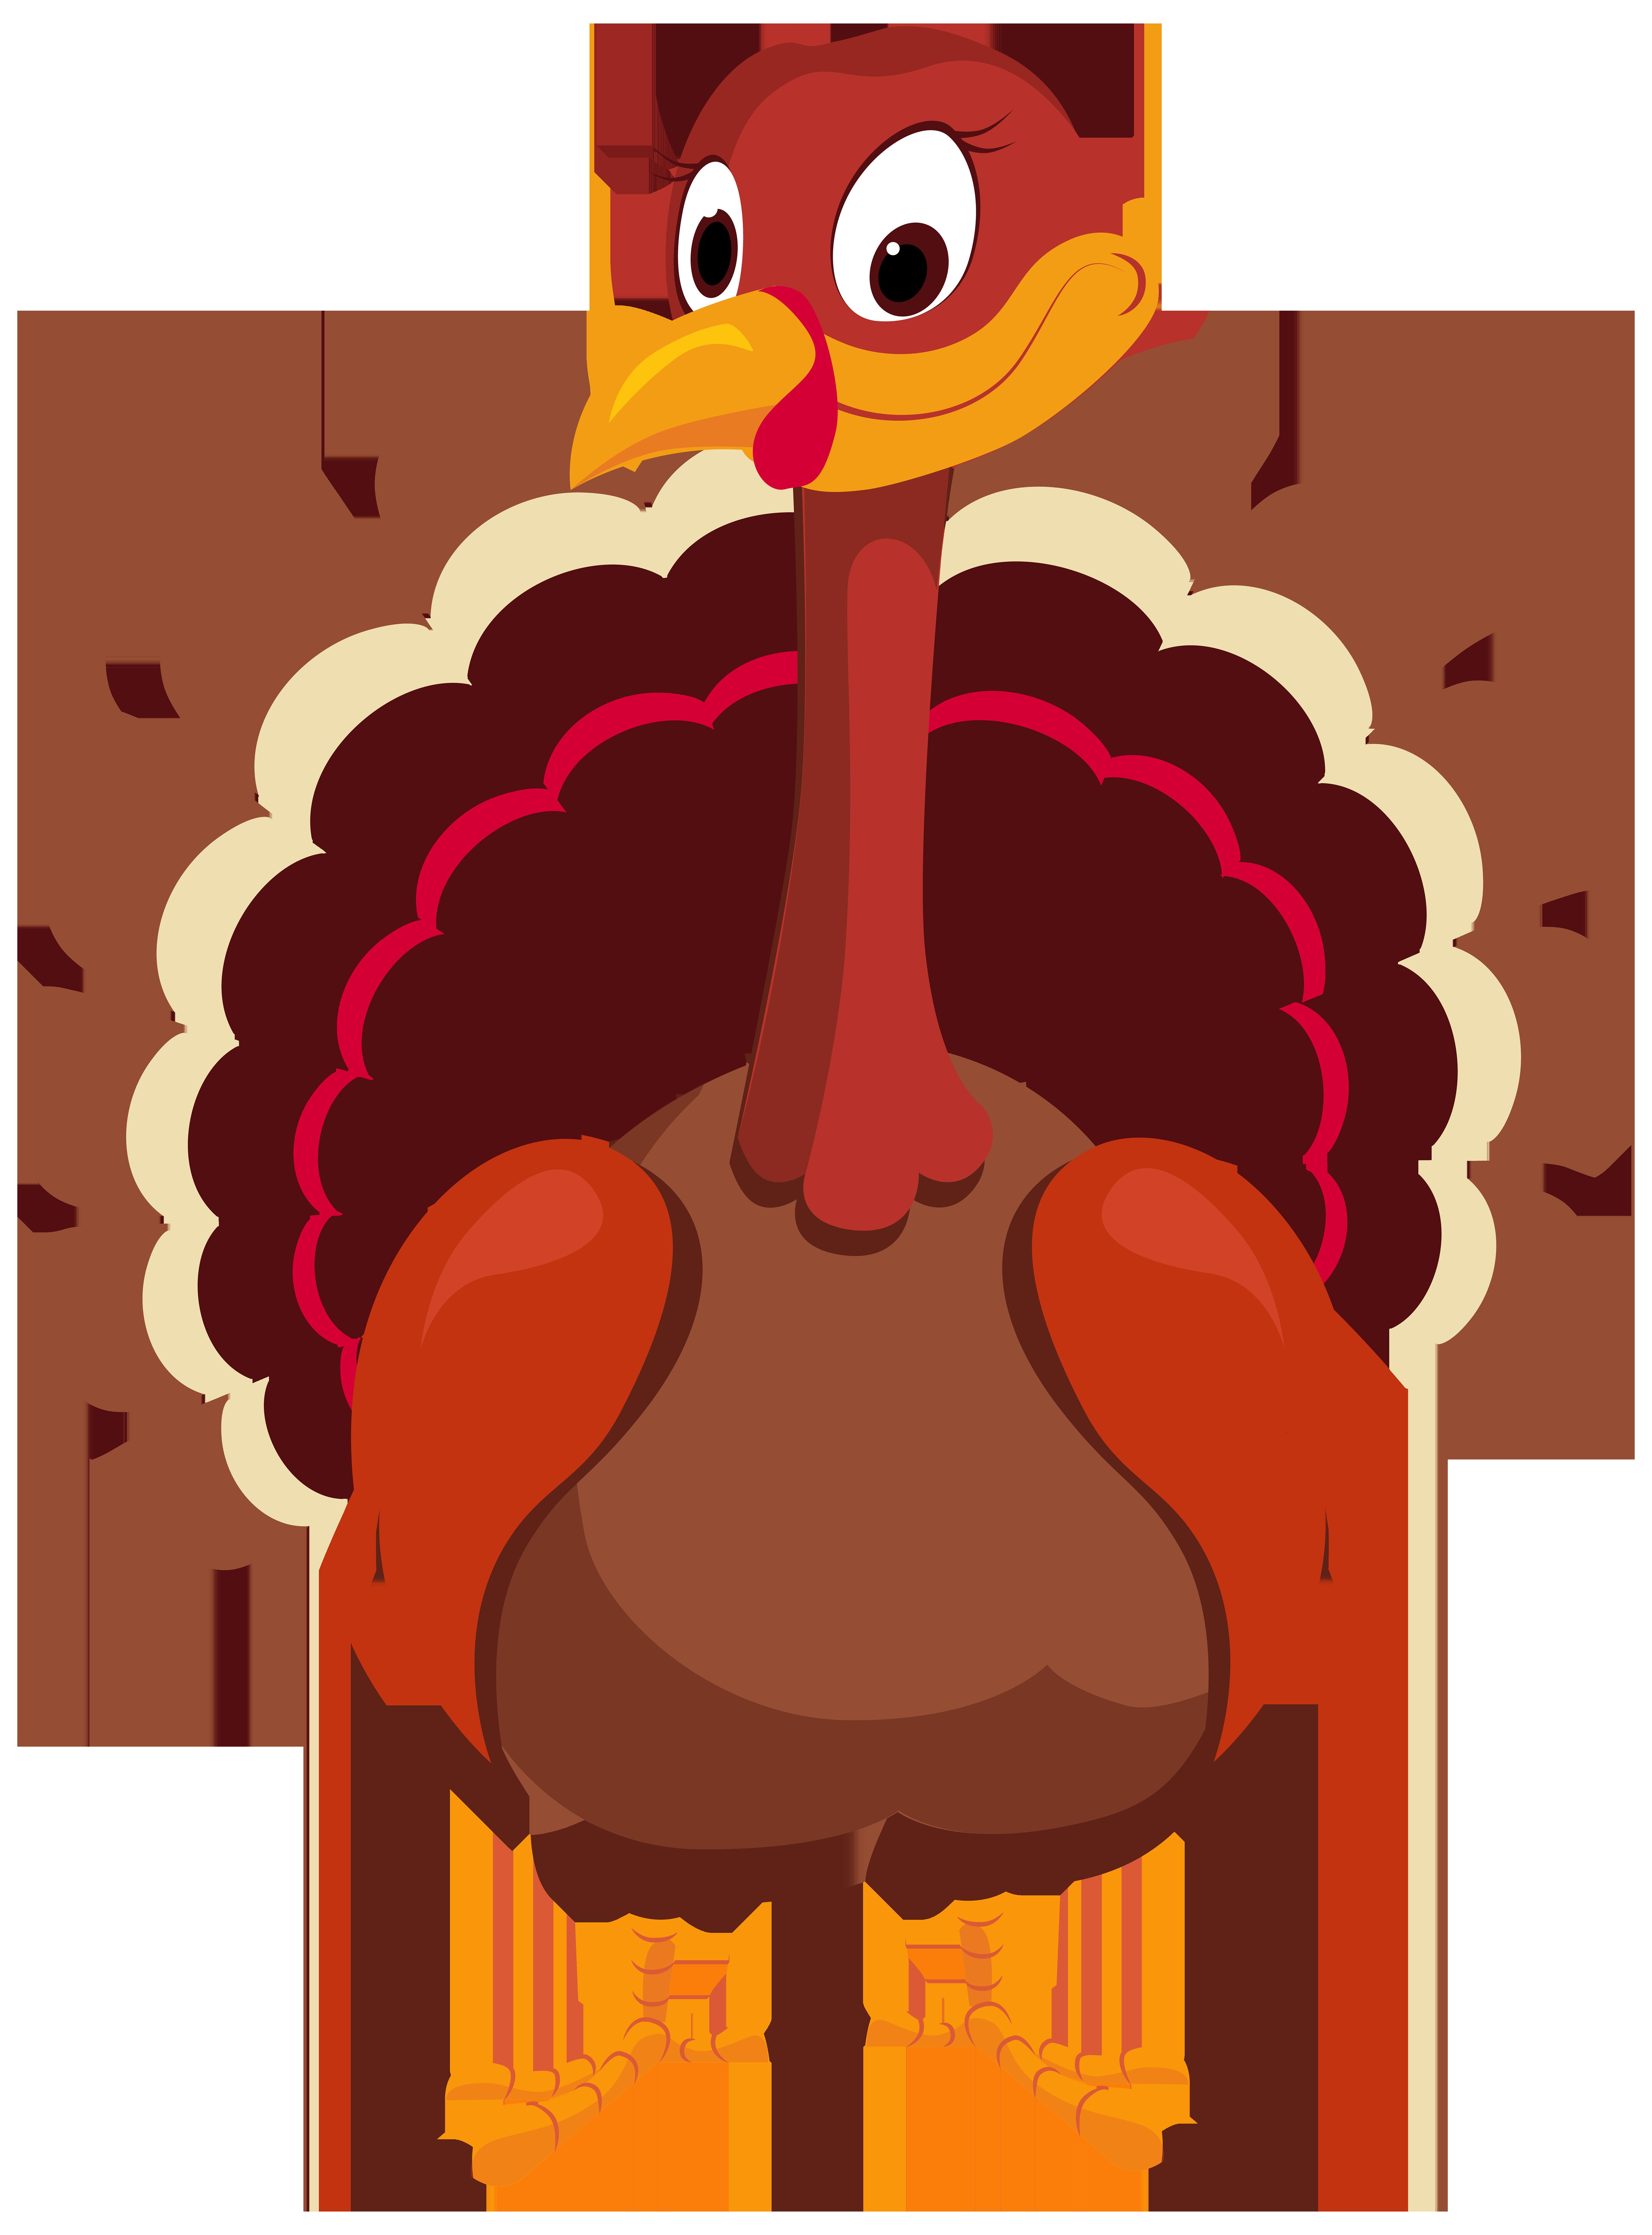 Png clip art image. Clipart turkey banner